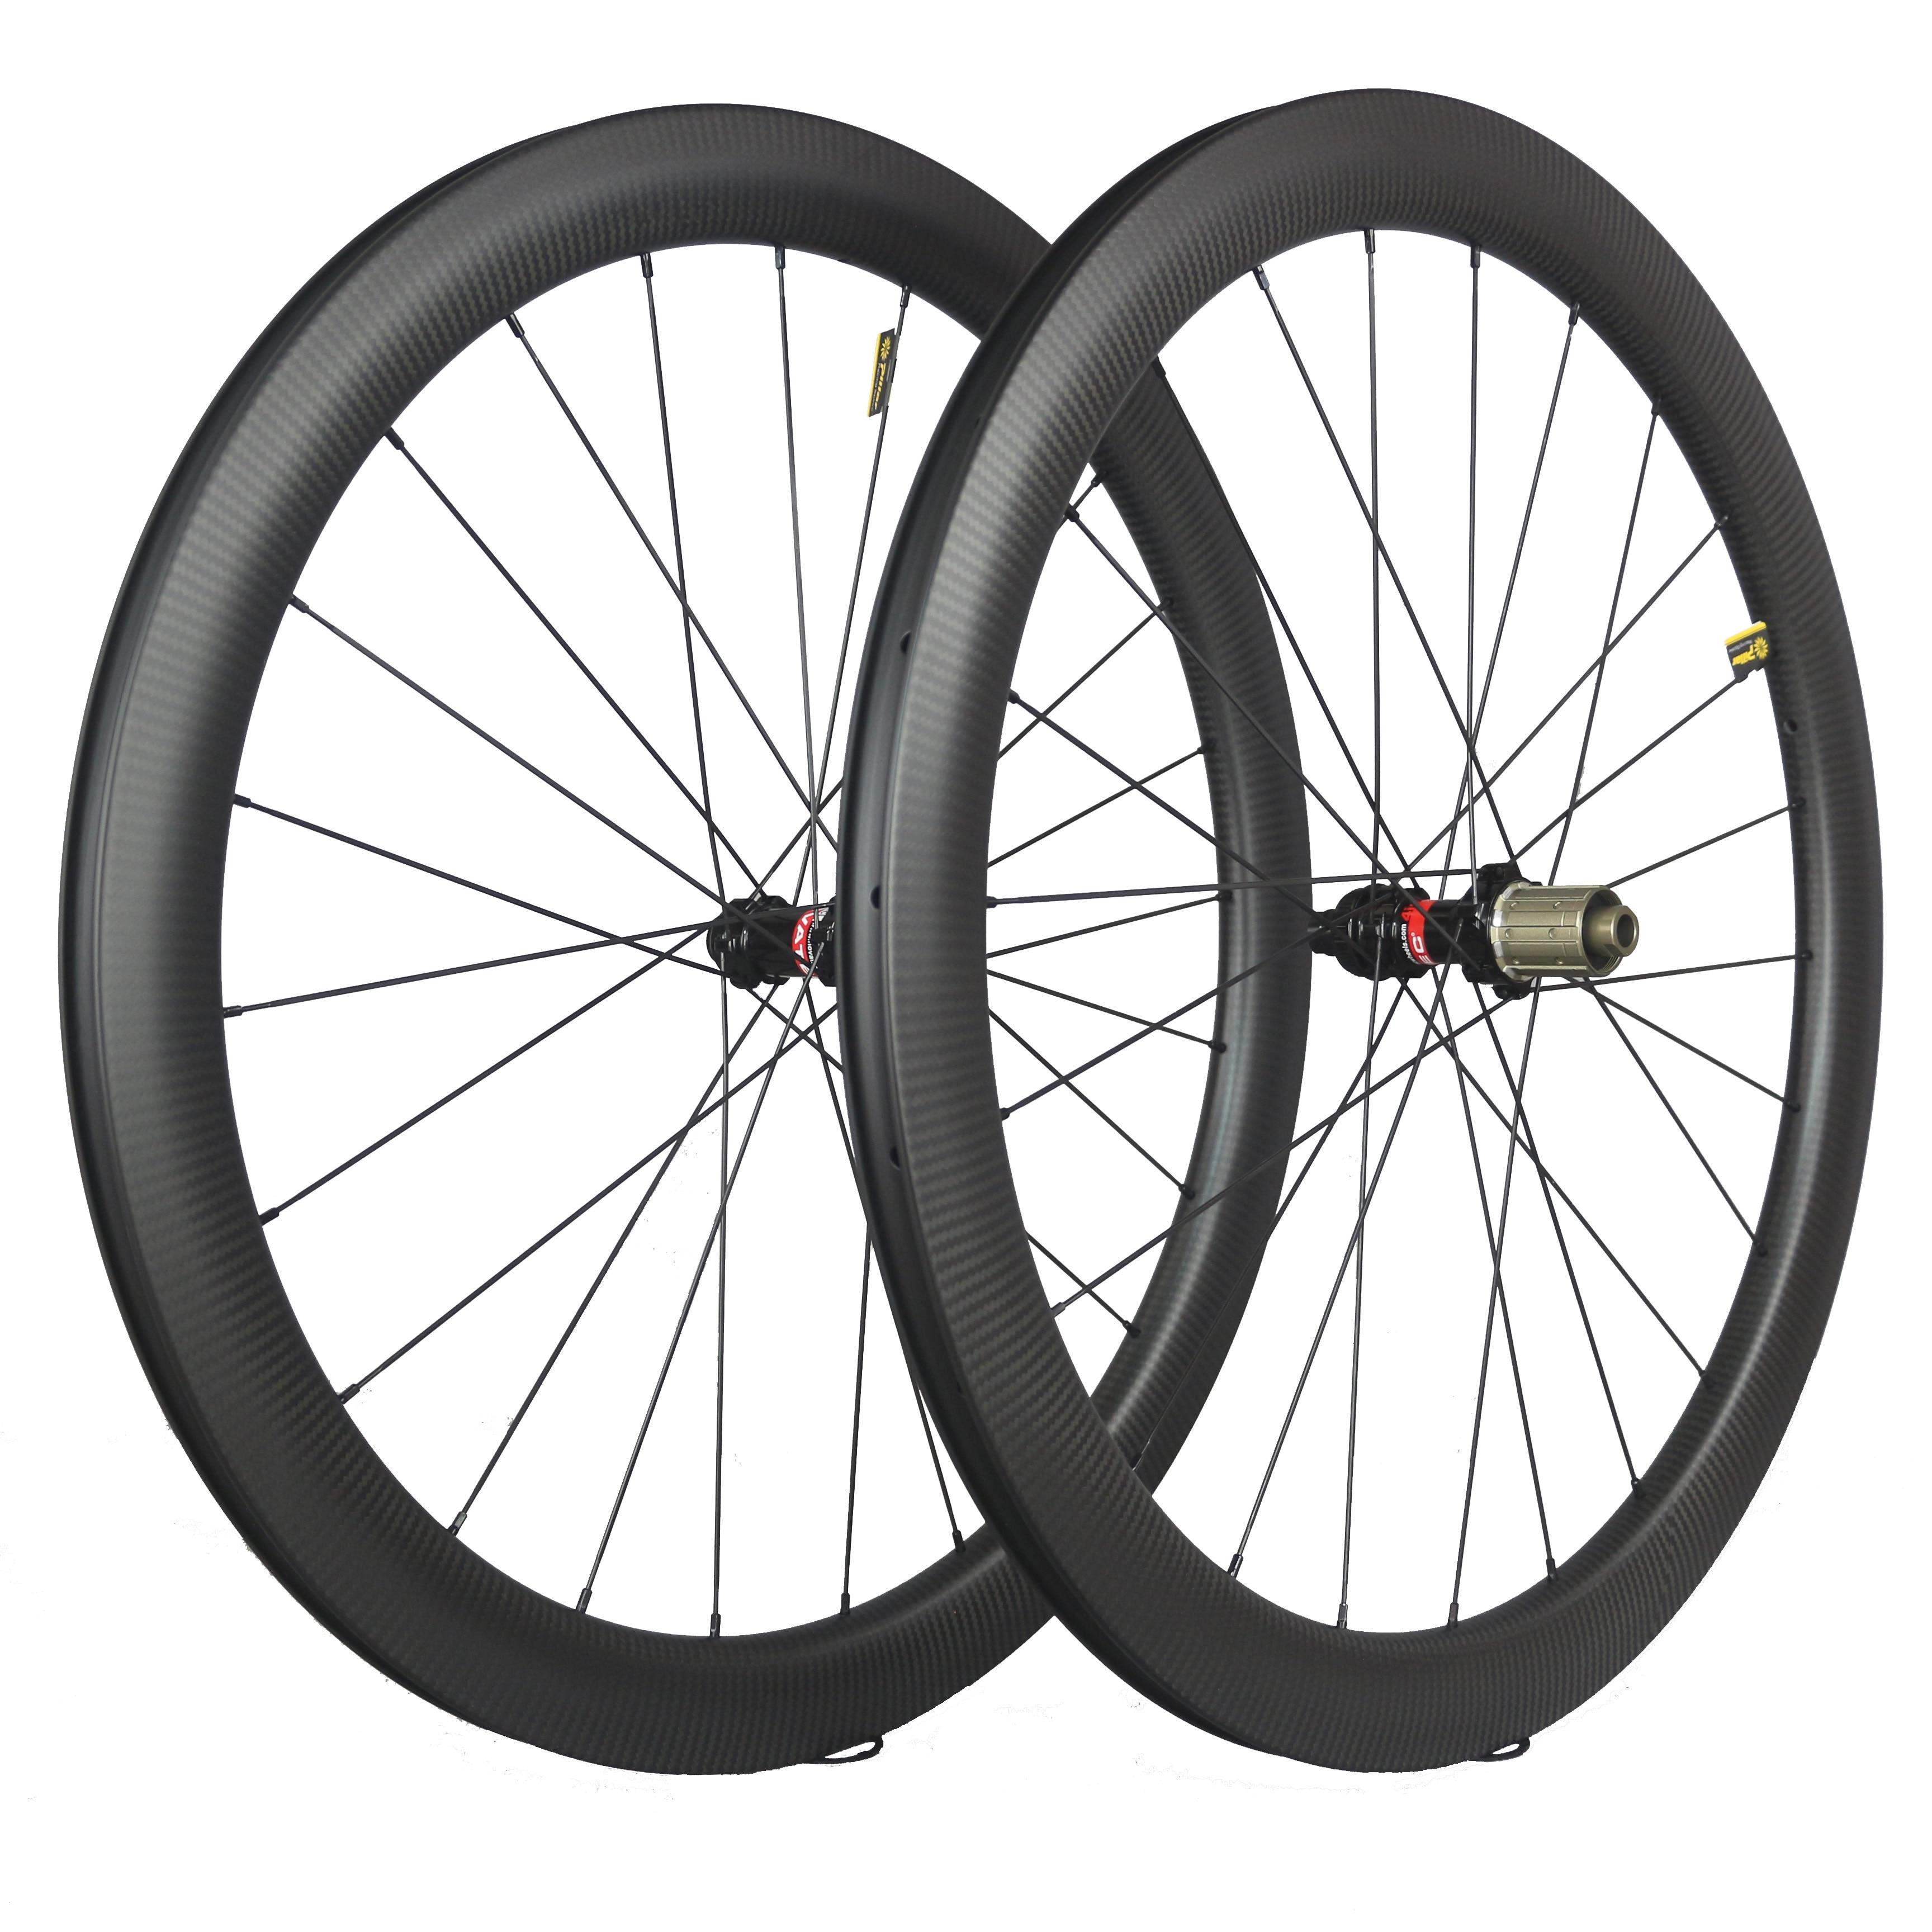 2019 New arrivals 3K twill road bike 50C wheels Pillar 1423 spoke D411/D412 front 12x100, rear 142x12   Gravel bike Wheels